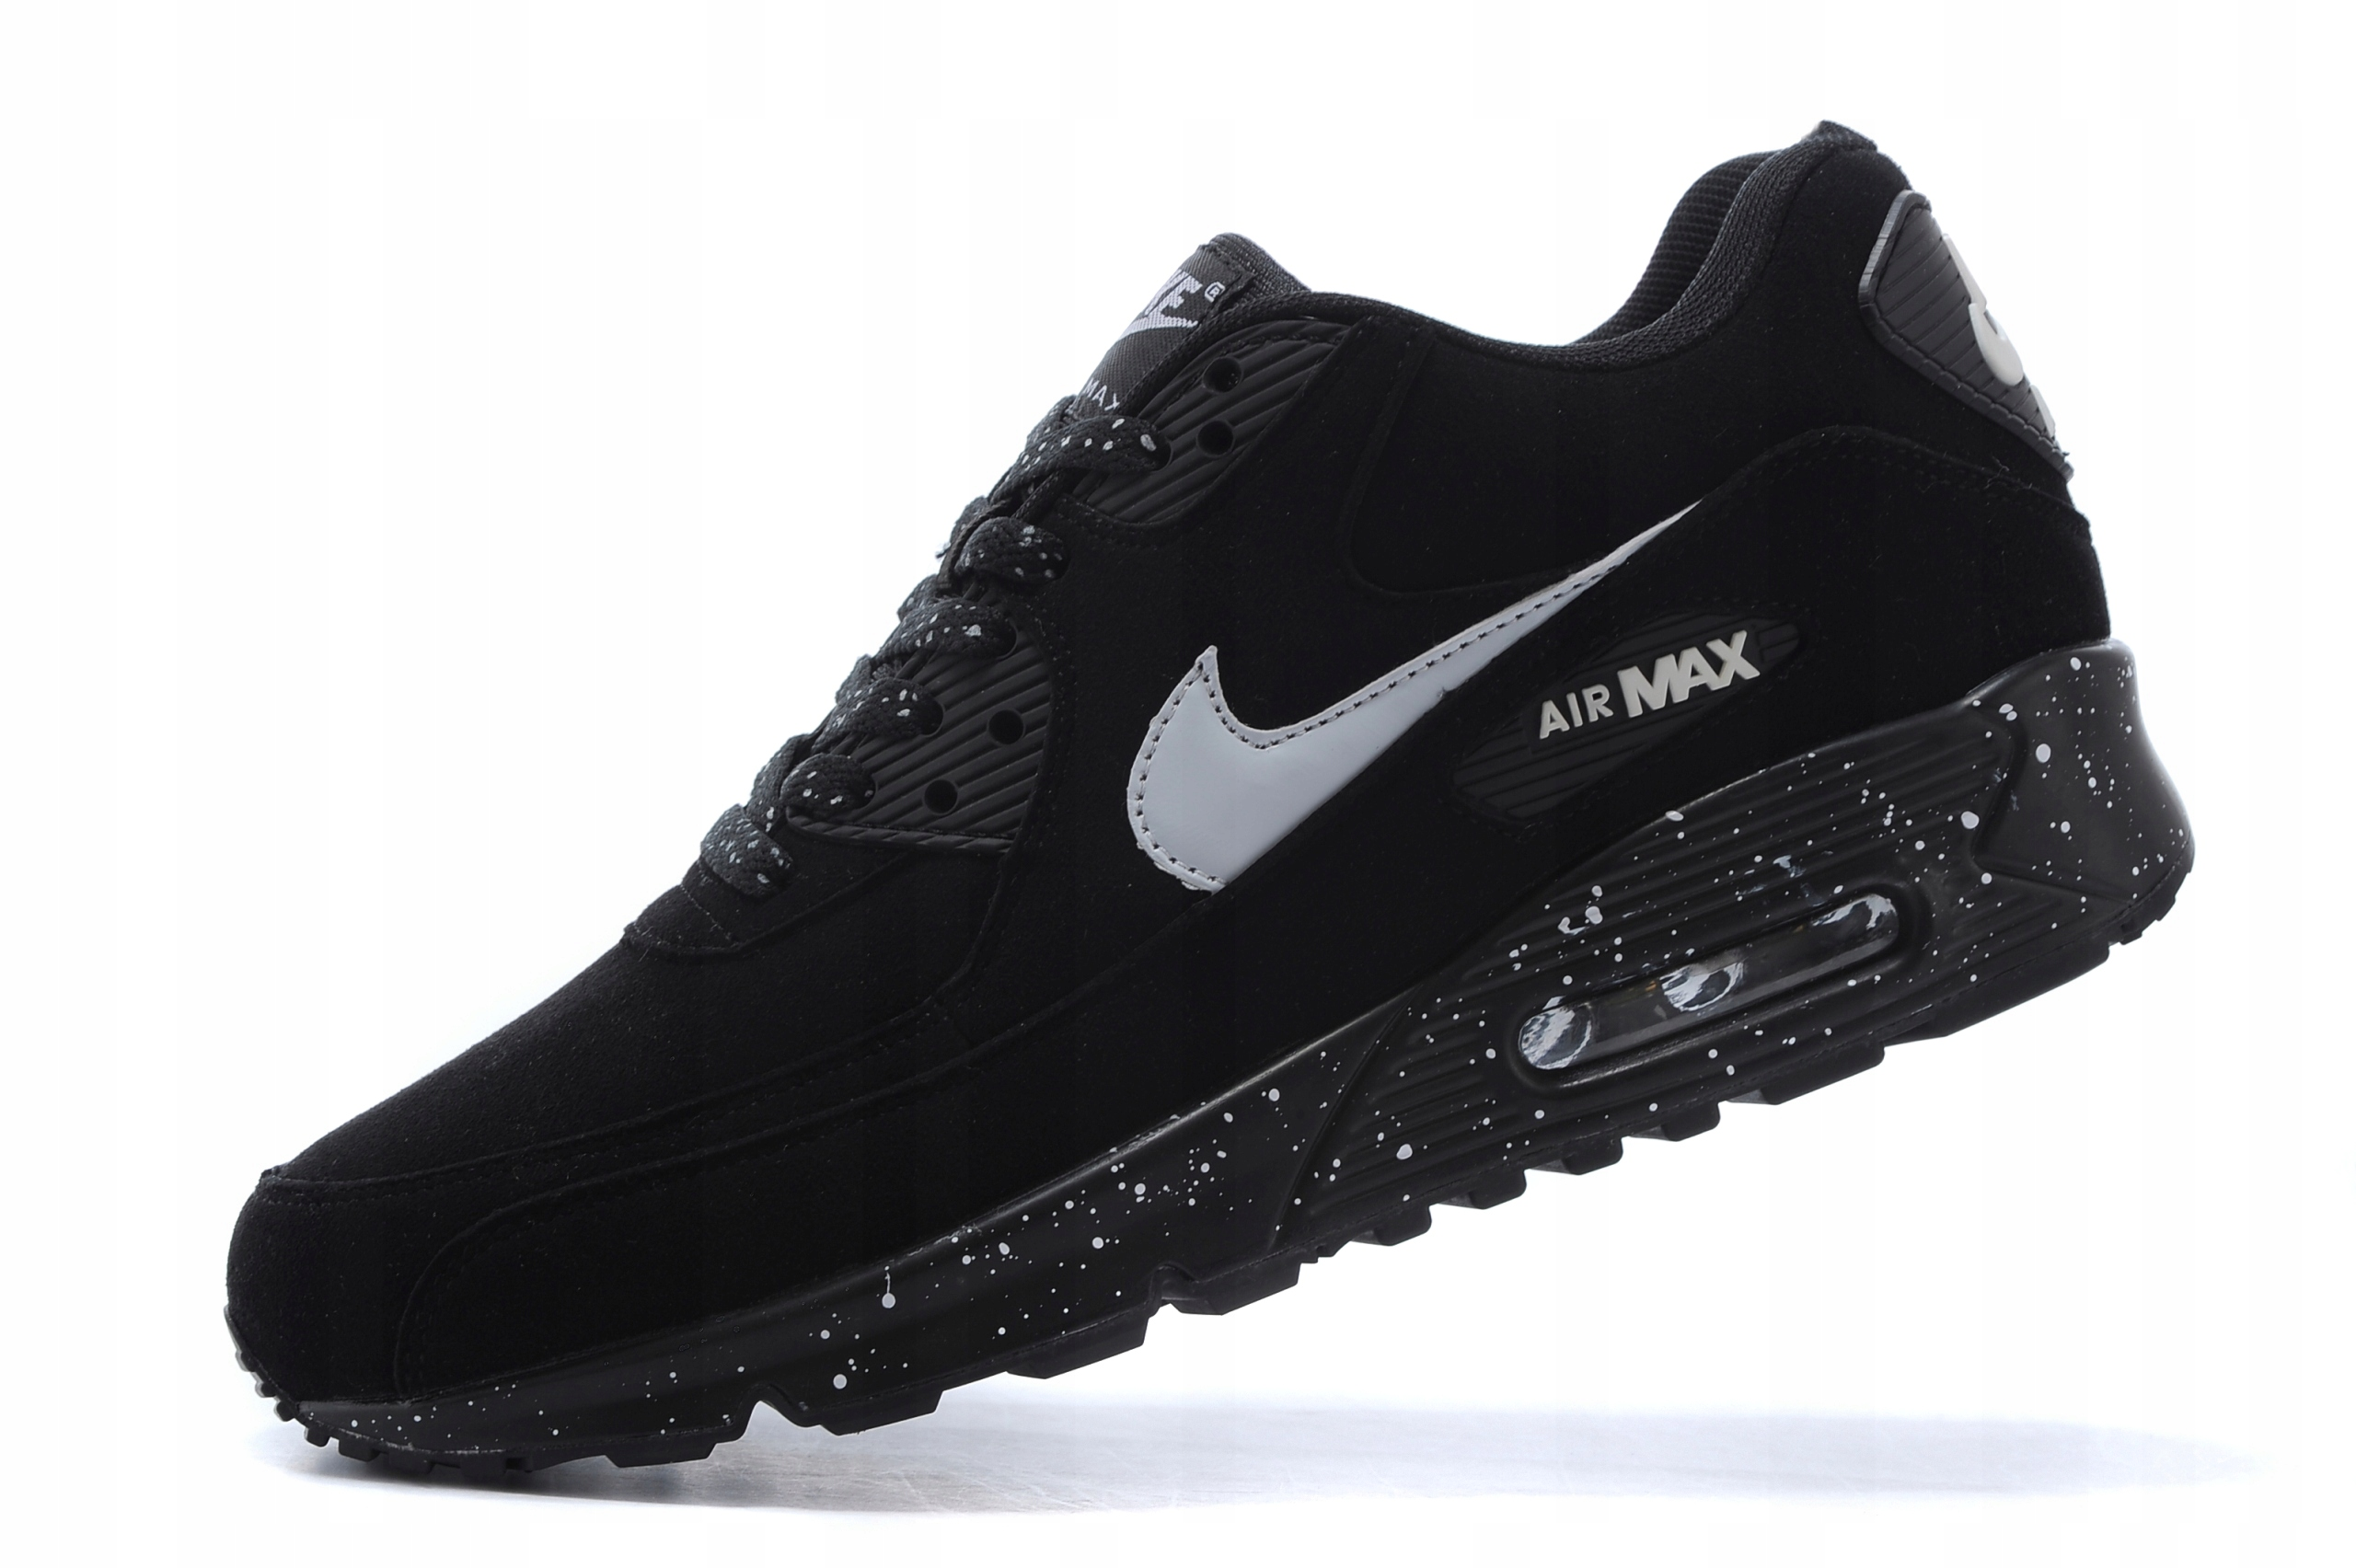 842e6d06c9a4d0 Buty DAMSKIE Nike Air Max OREO r.38 Promocja - 7487098534 ...